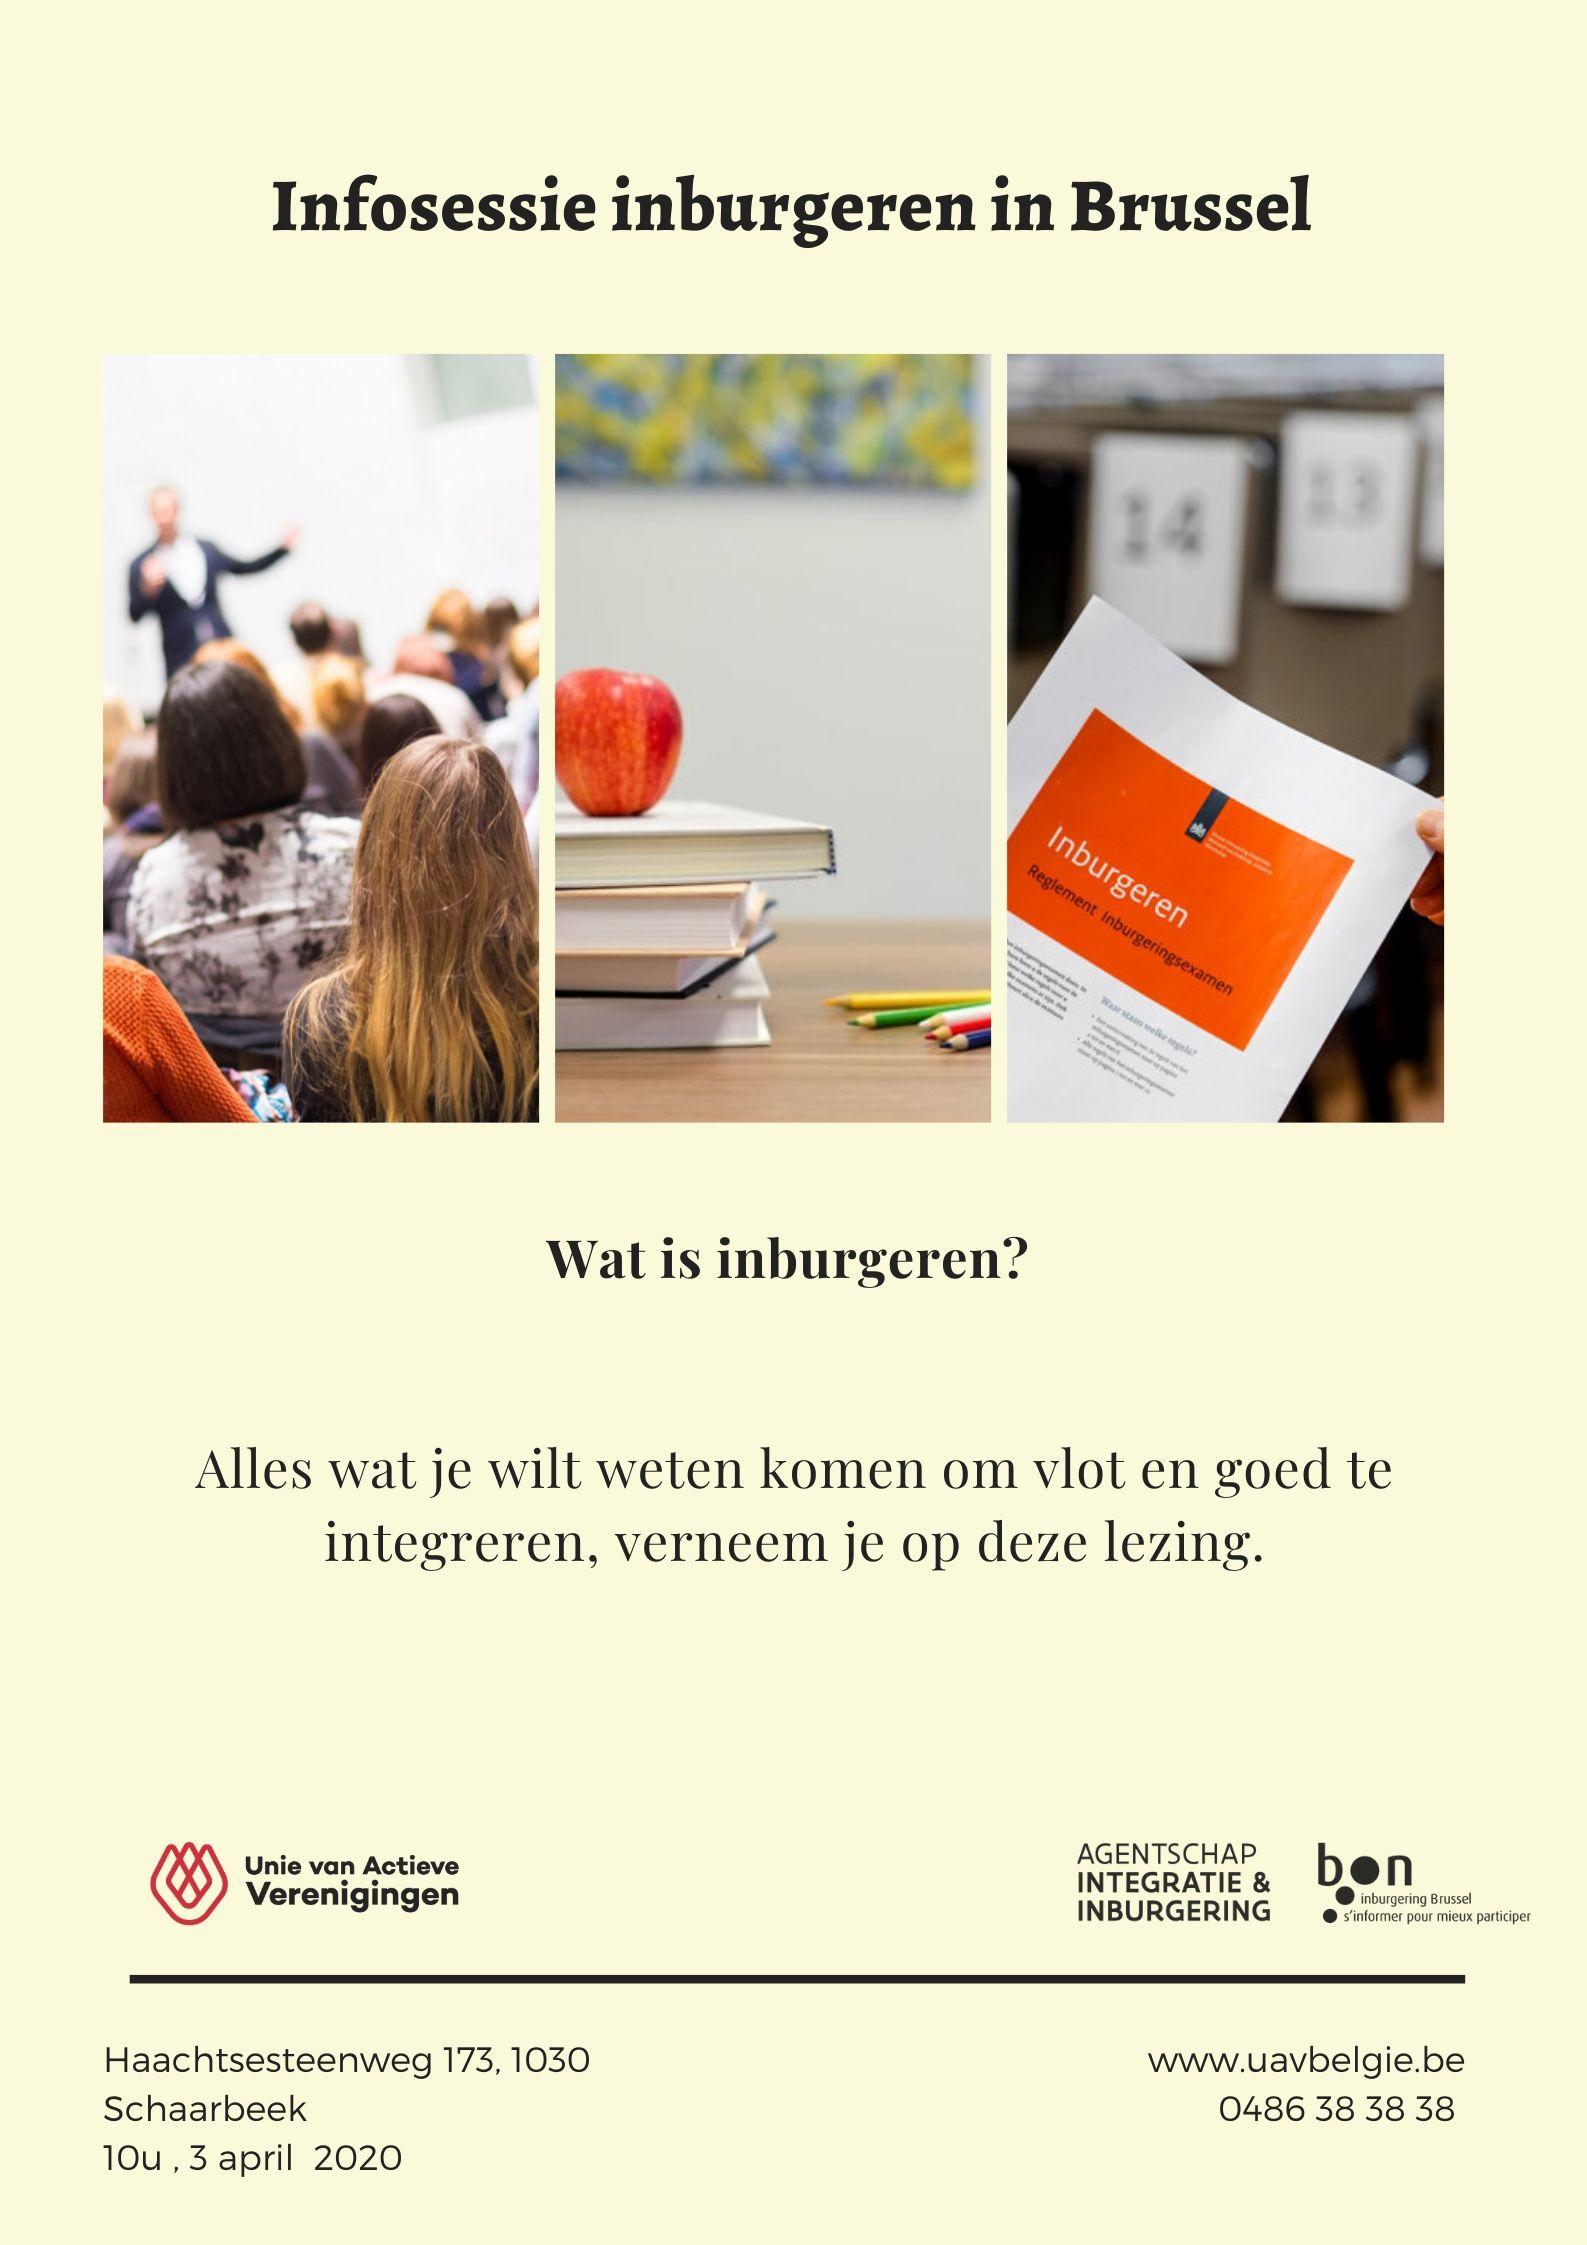 Infosessie: Inburgeren in Brussel